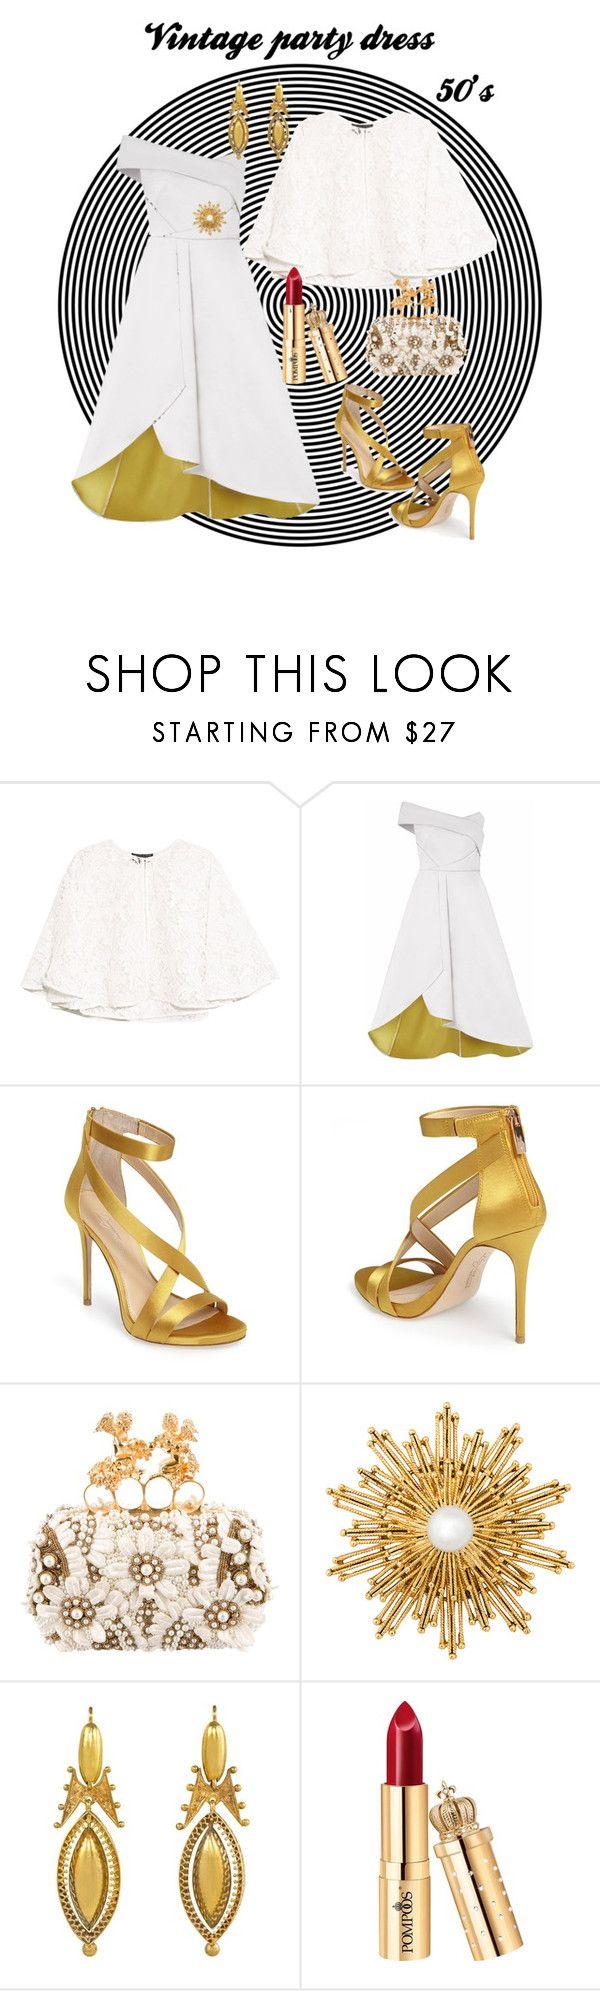 """vintage dress"" by marticarvallo ❤ liked on Polyvore featuring NOIR Sachin + Babi, Imagine by Vince Camuto, Alexander McQueen, Oscar de la Renta and vintage"